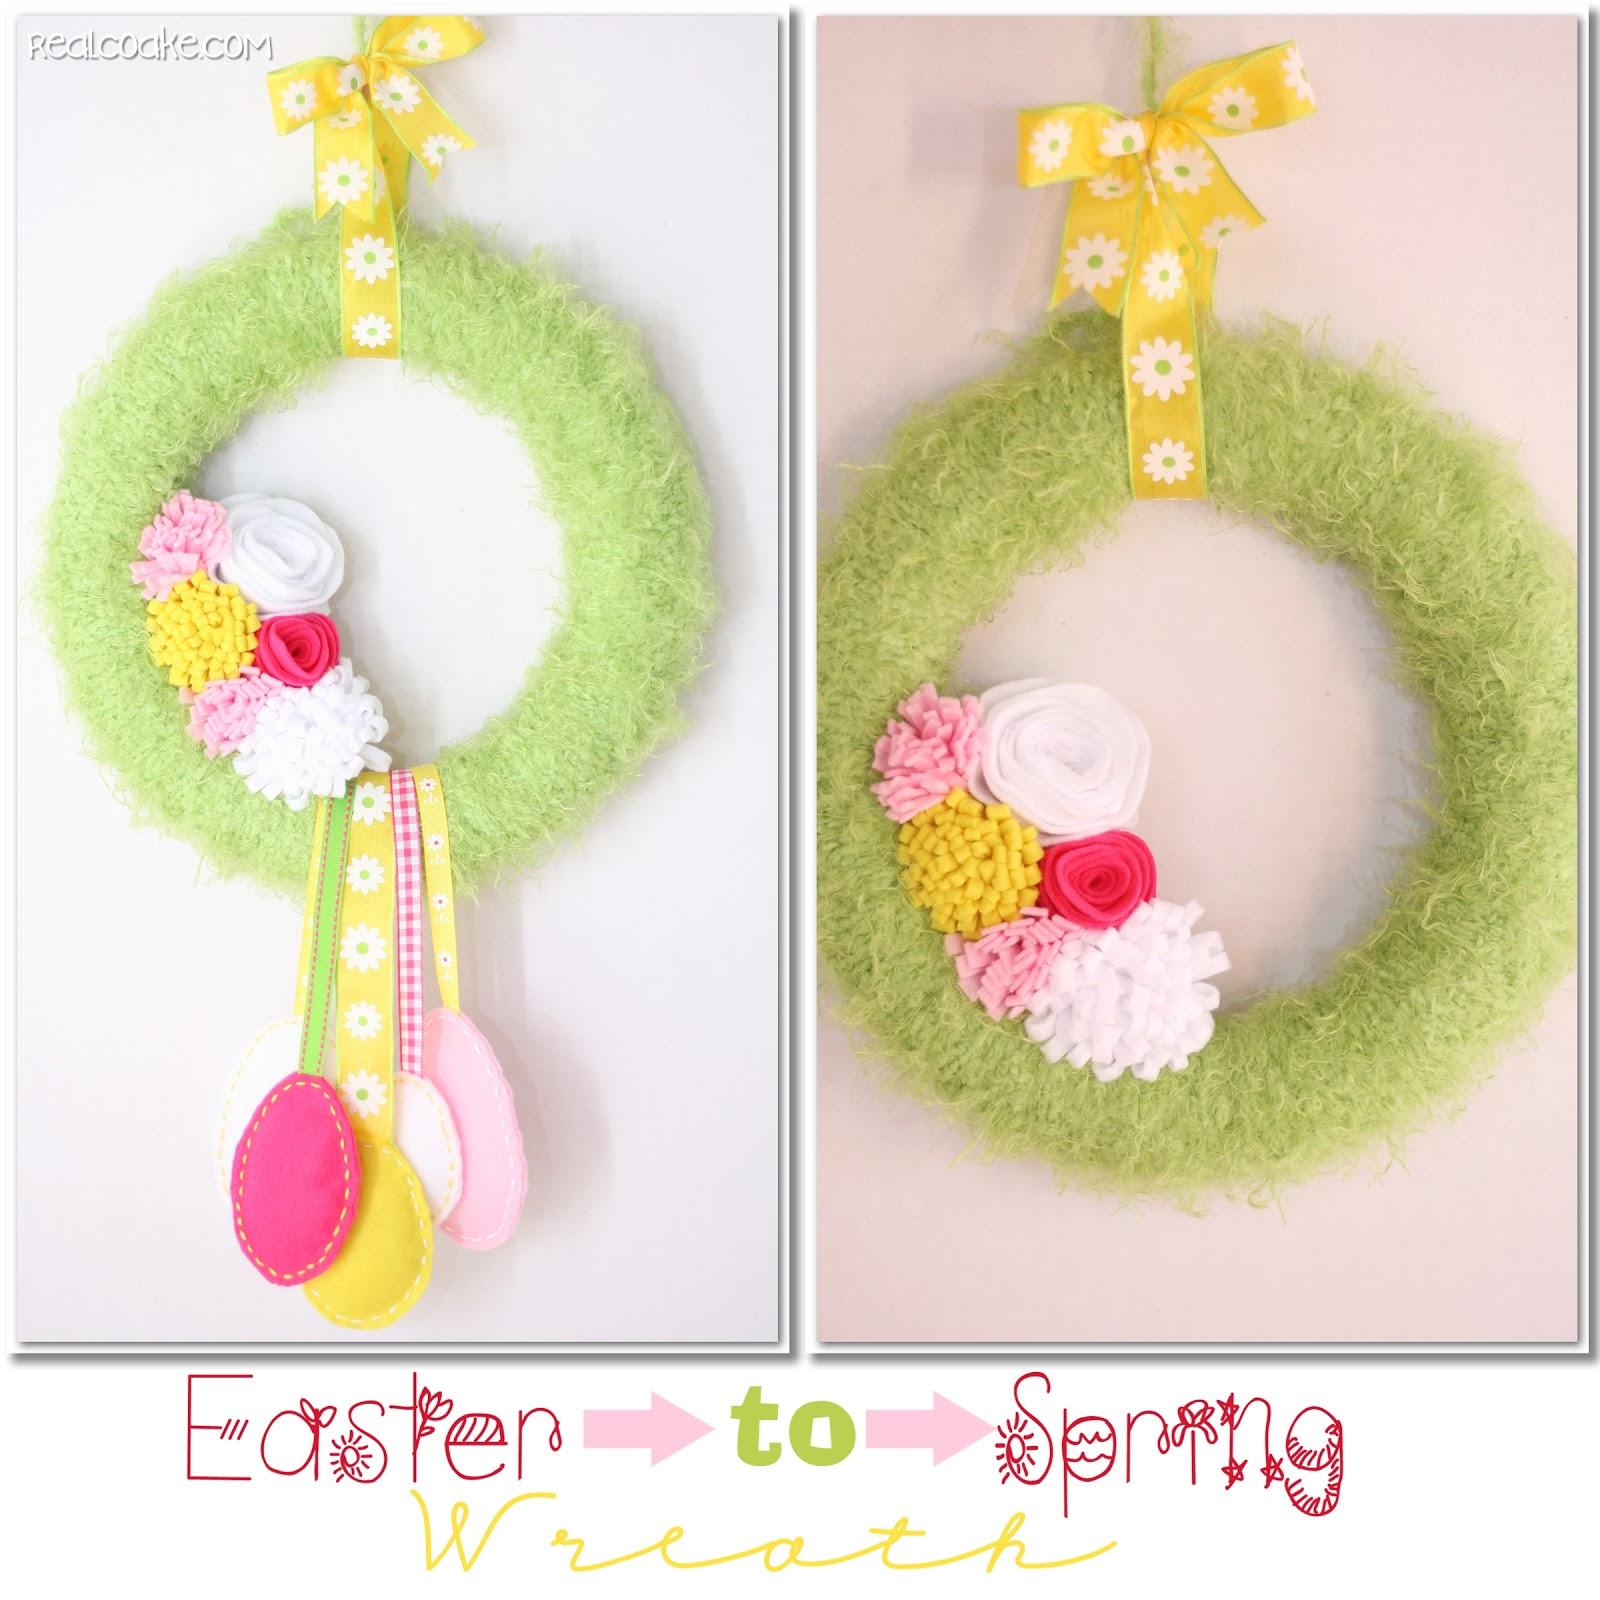 12 Fun Easter Ideas/Crafts